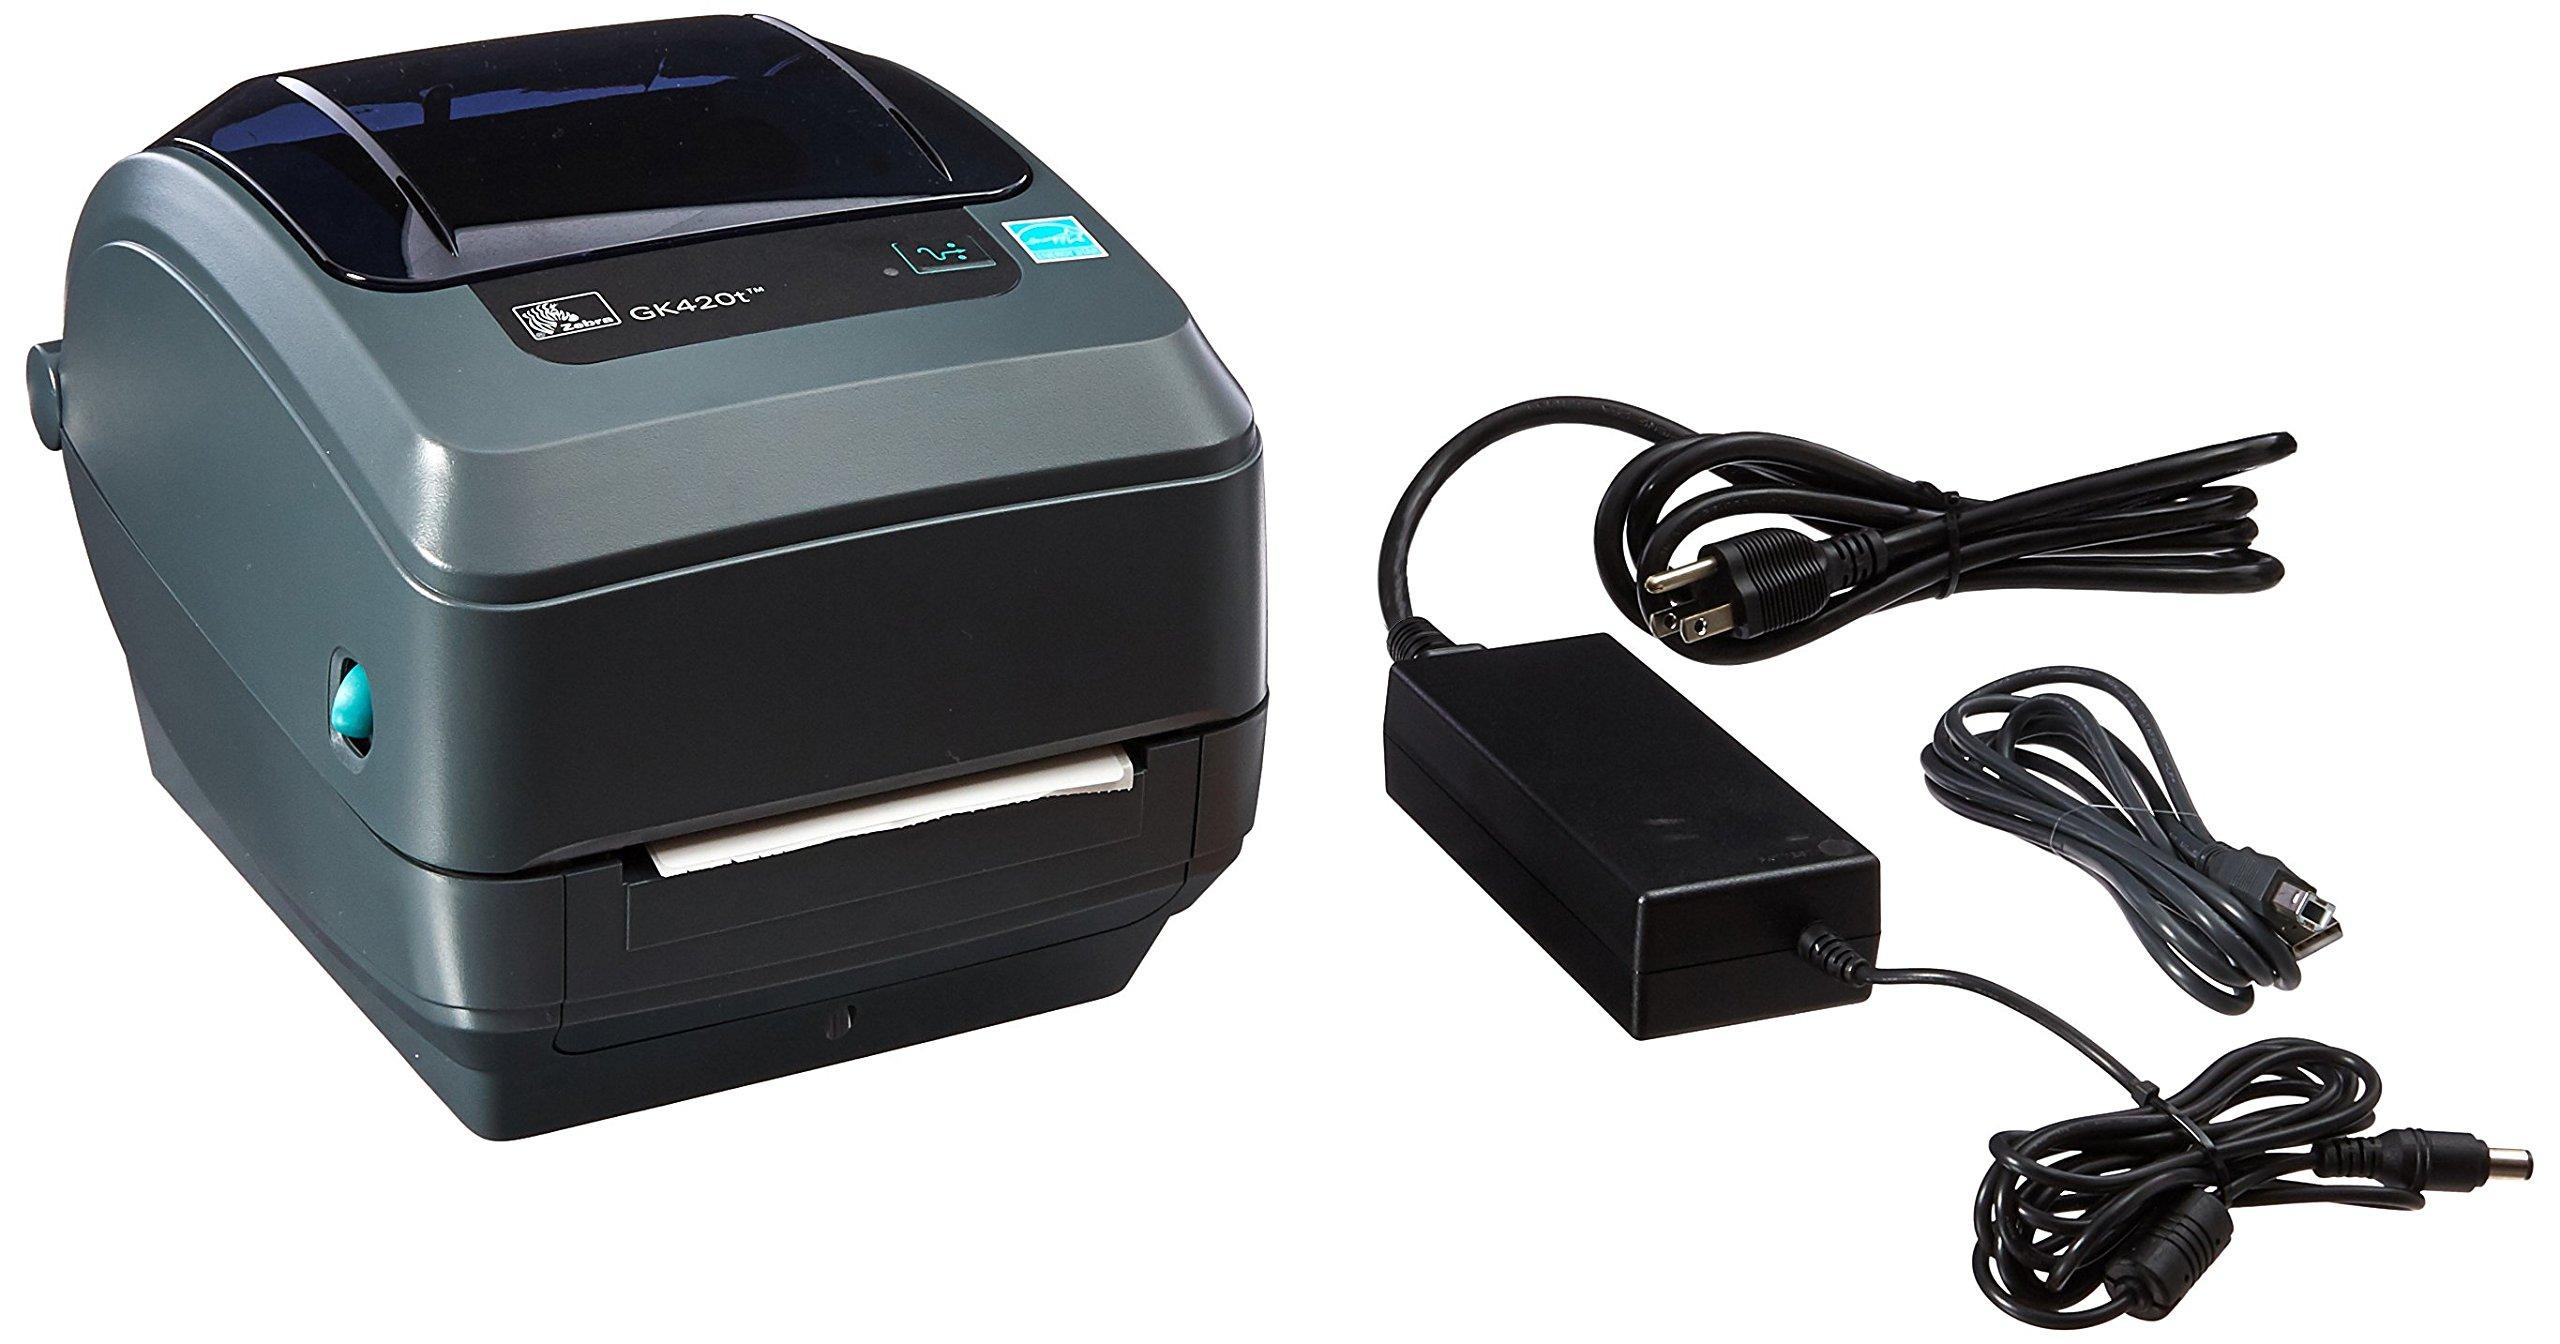 Zebra GK420t Monochrome Desktop Direct Thermal/Thermal Transfer Label Printer with Fast Ethernet Technology, 5 in/s Print Speed, 203 dpi Print Resolution, 4.09'' Print Width, 100/240V AC